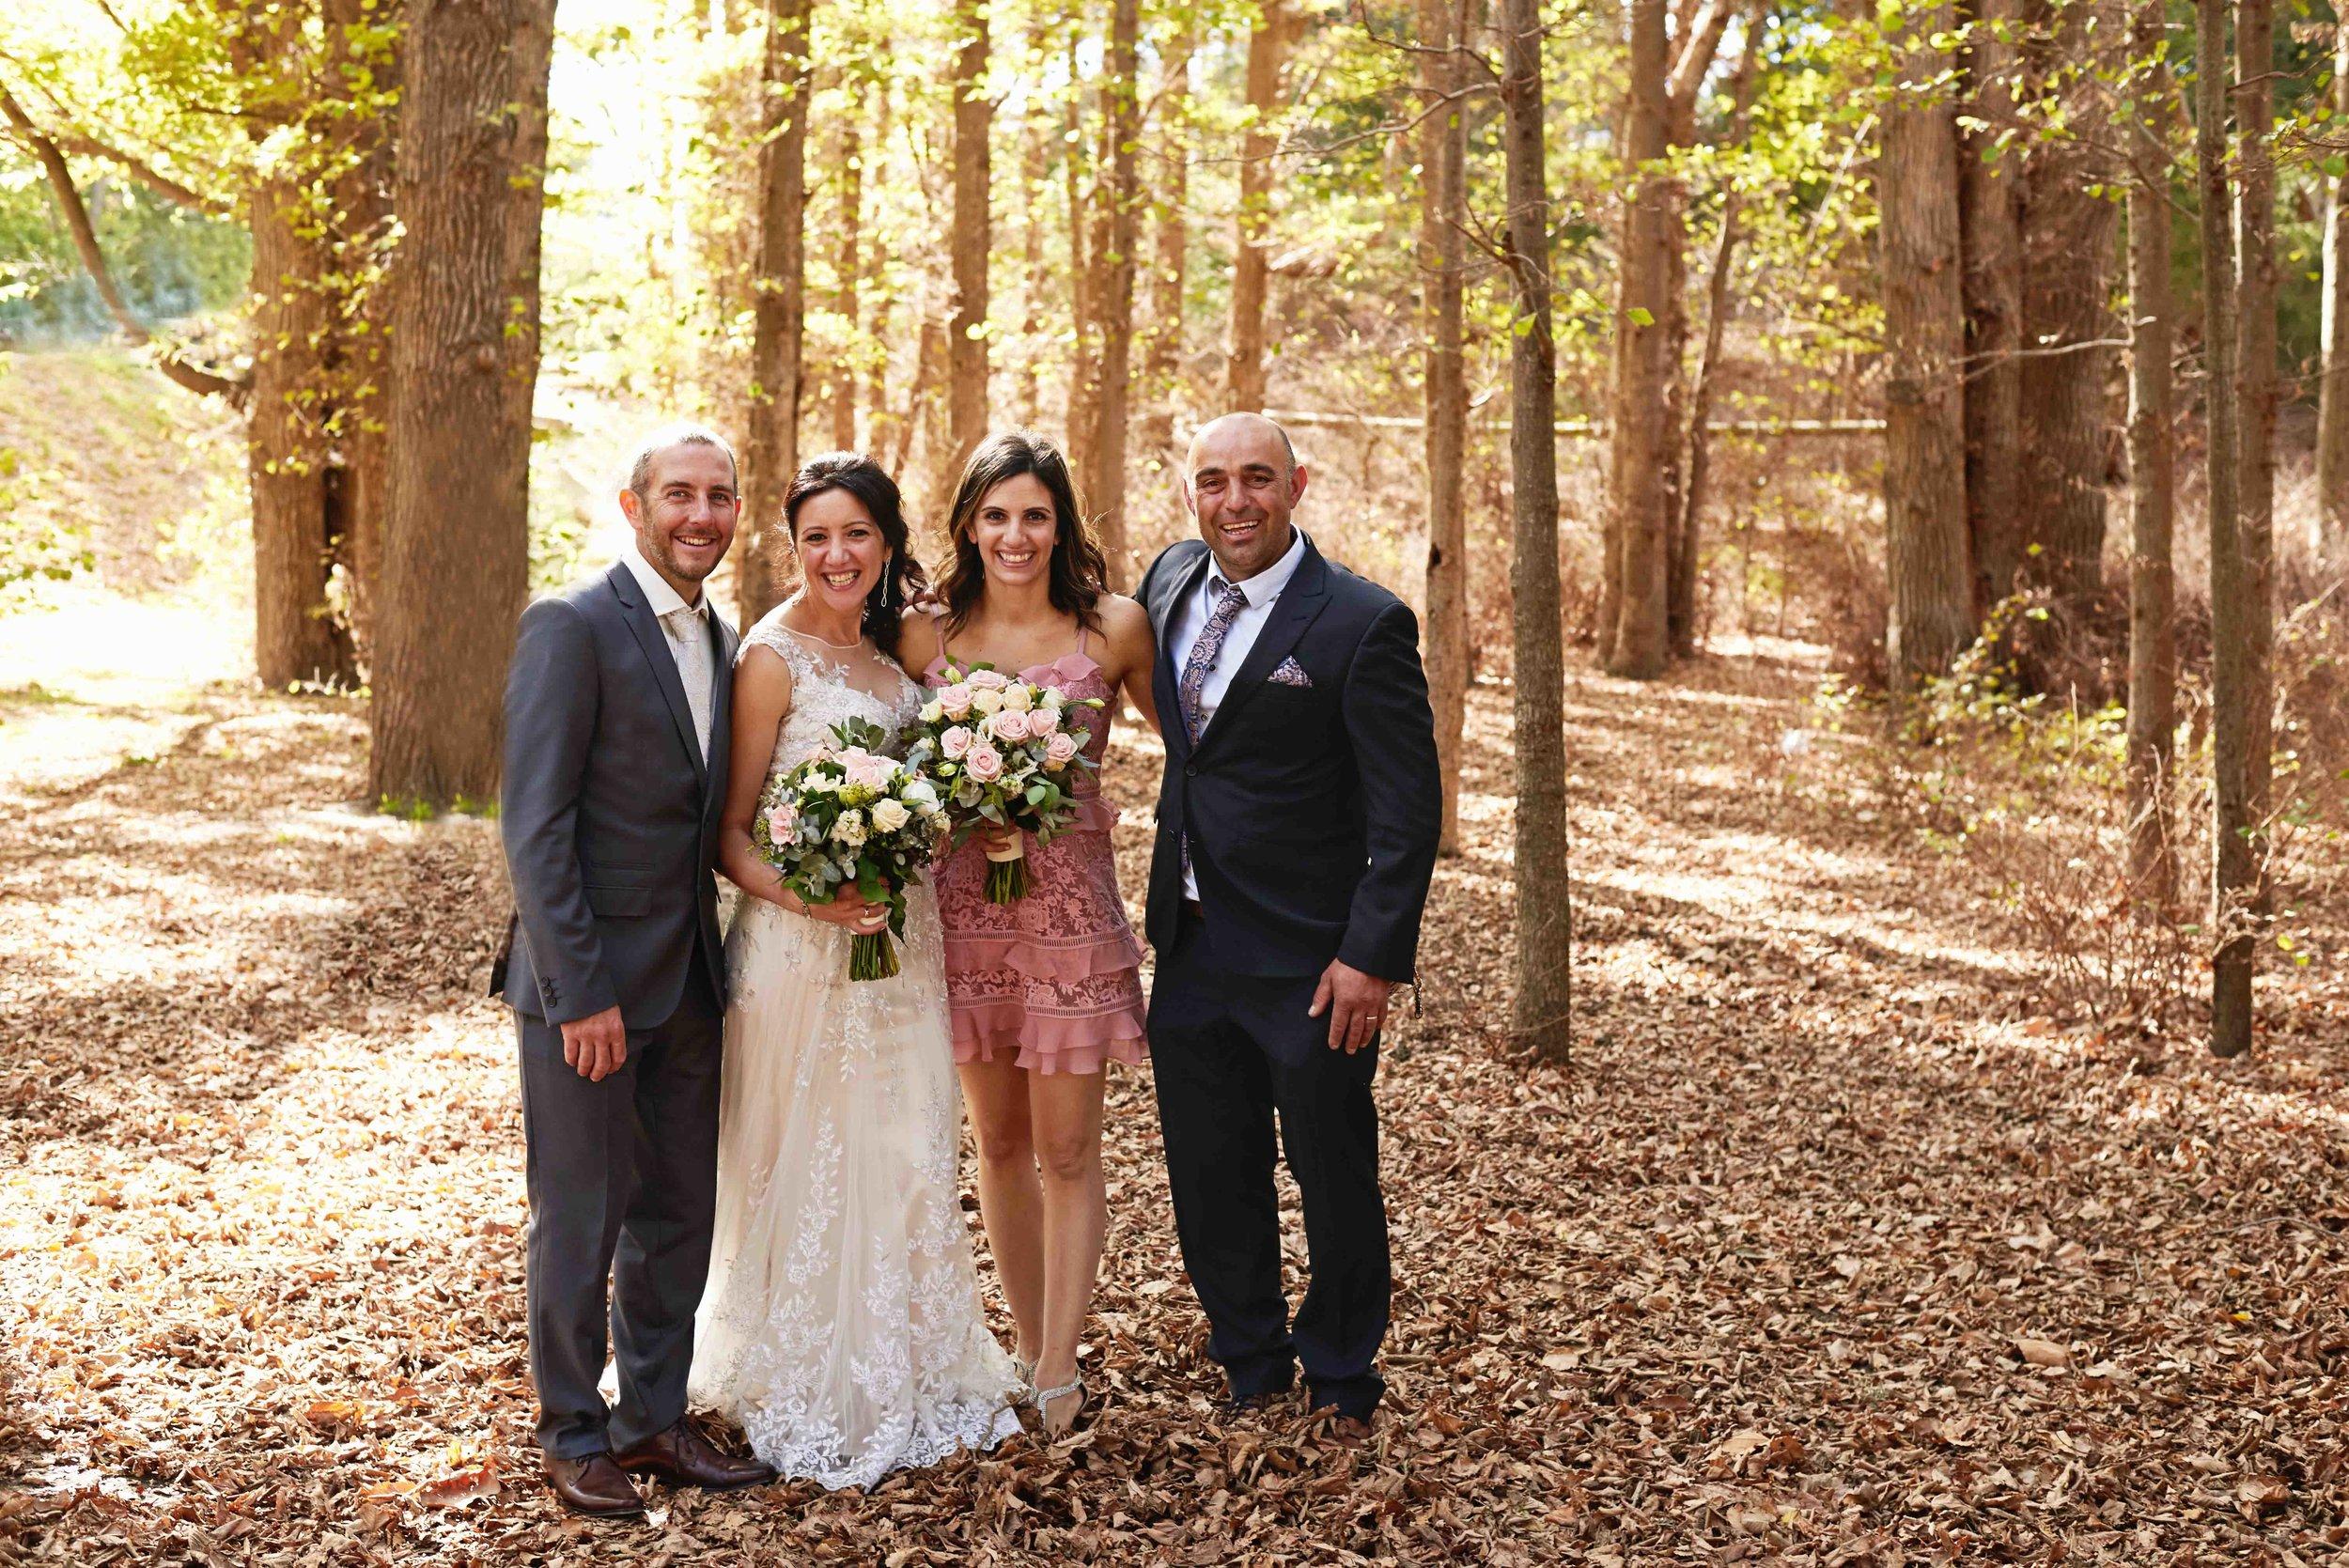 sorrento-wedding-photography-all-smiles-marissa-jade-photography-148.jpg